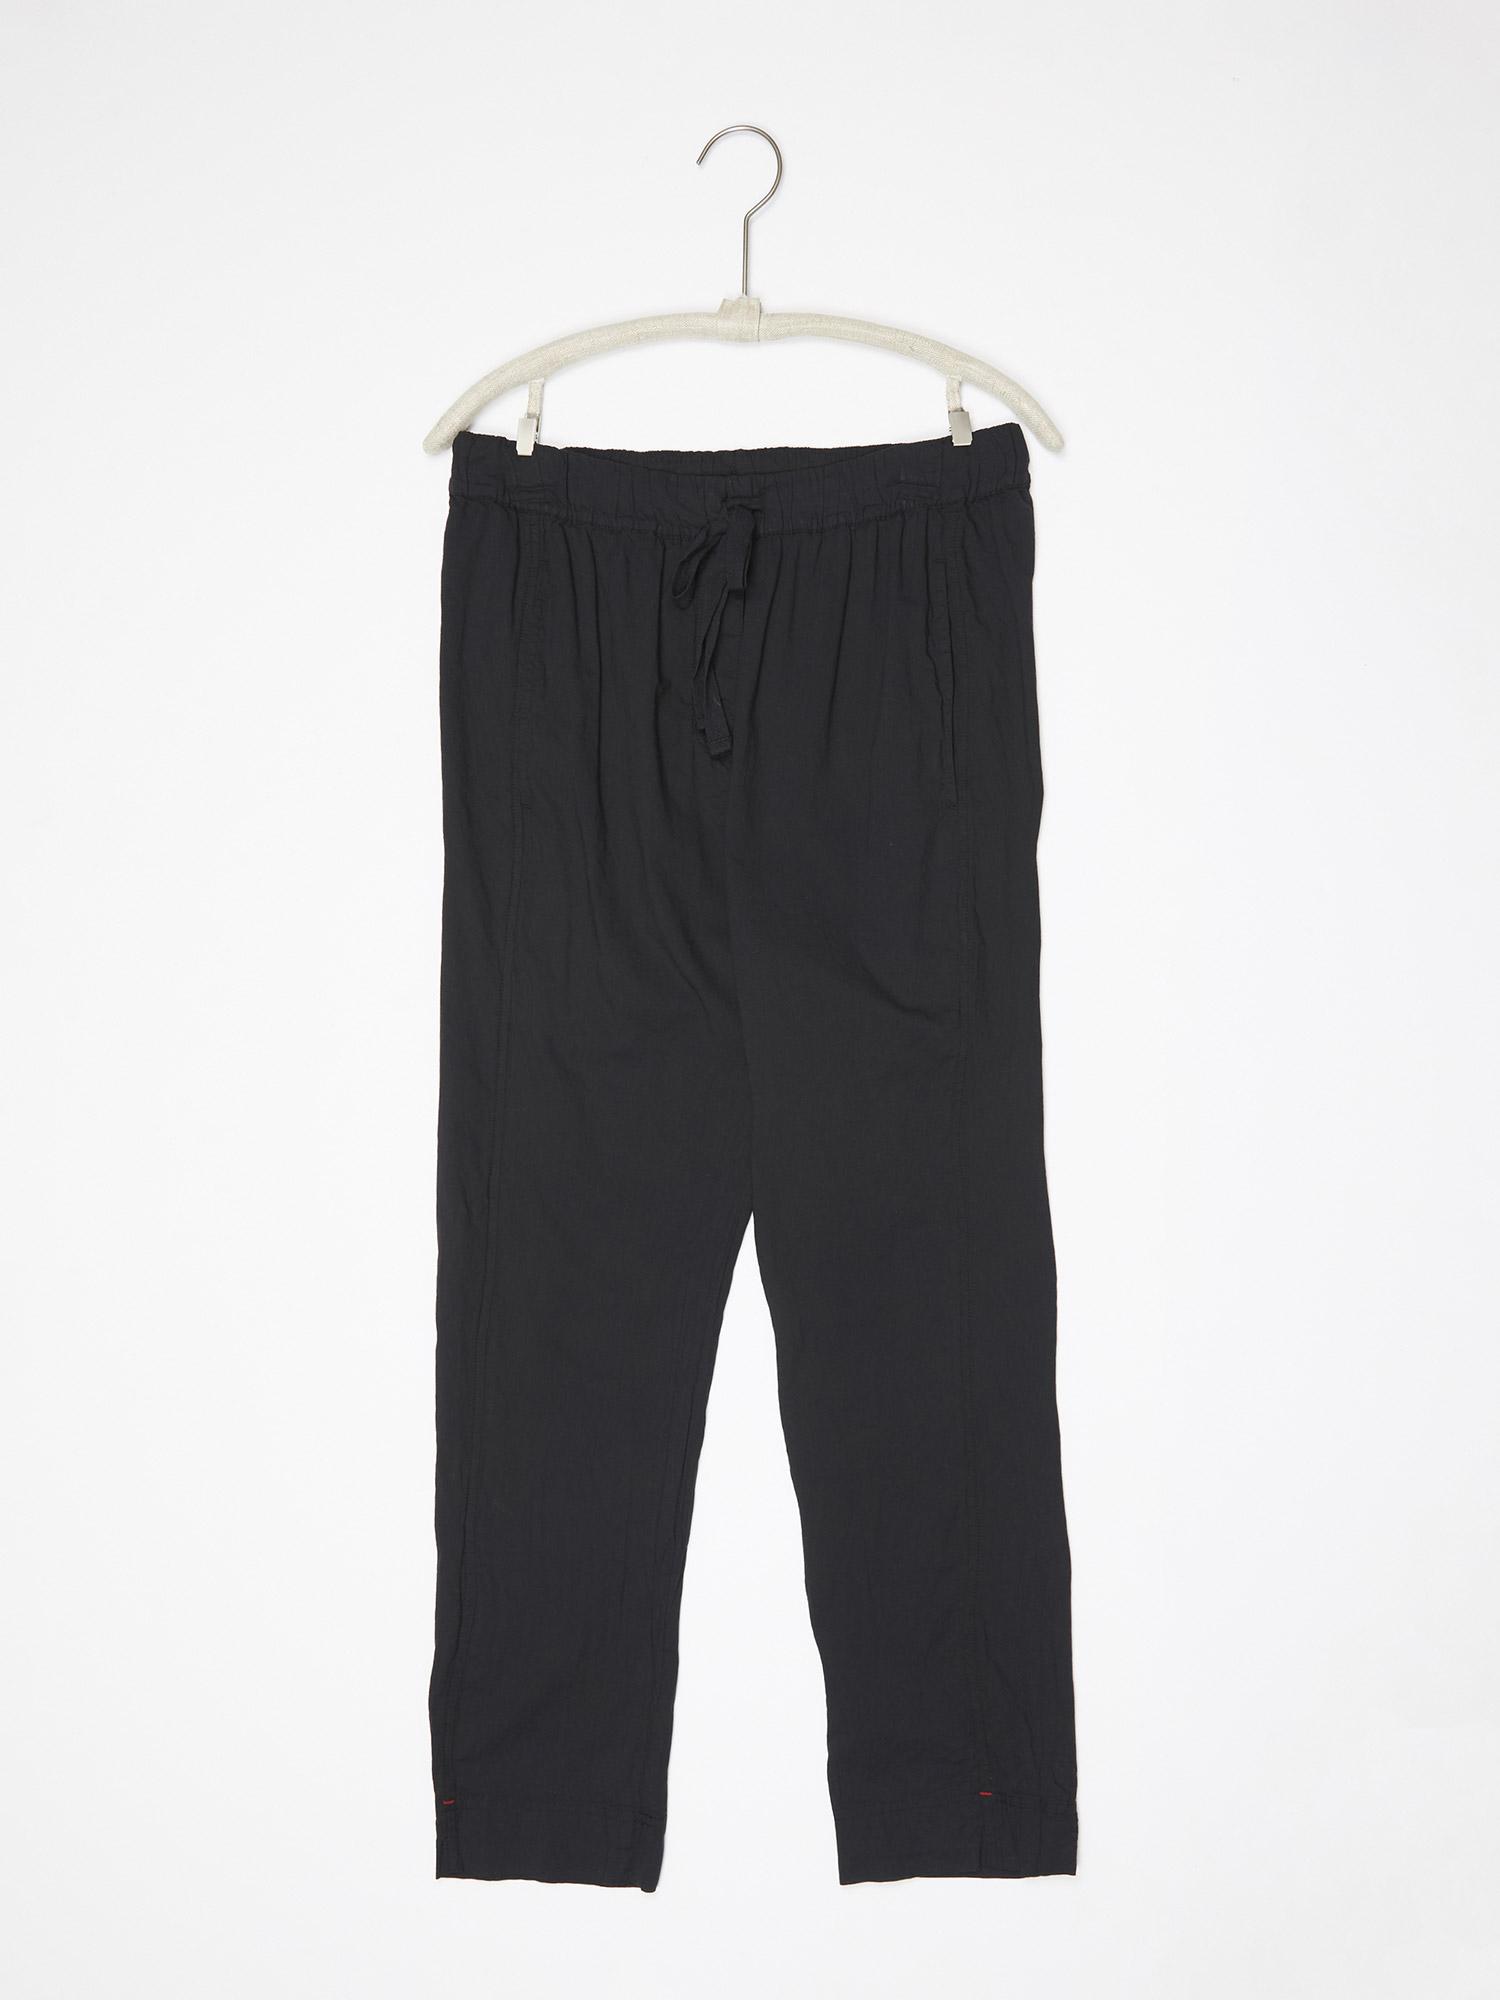 Hose, Draper, Xirena, Baumwollhose, Pull-on Pants